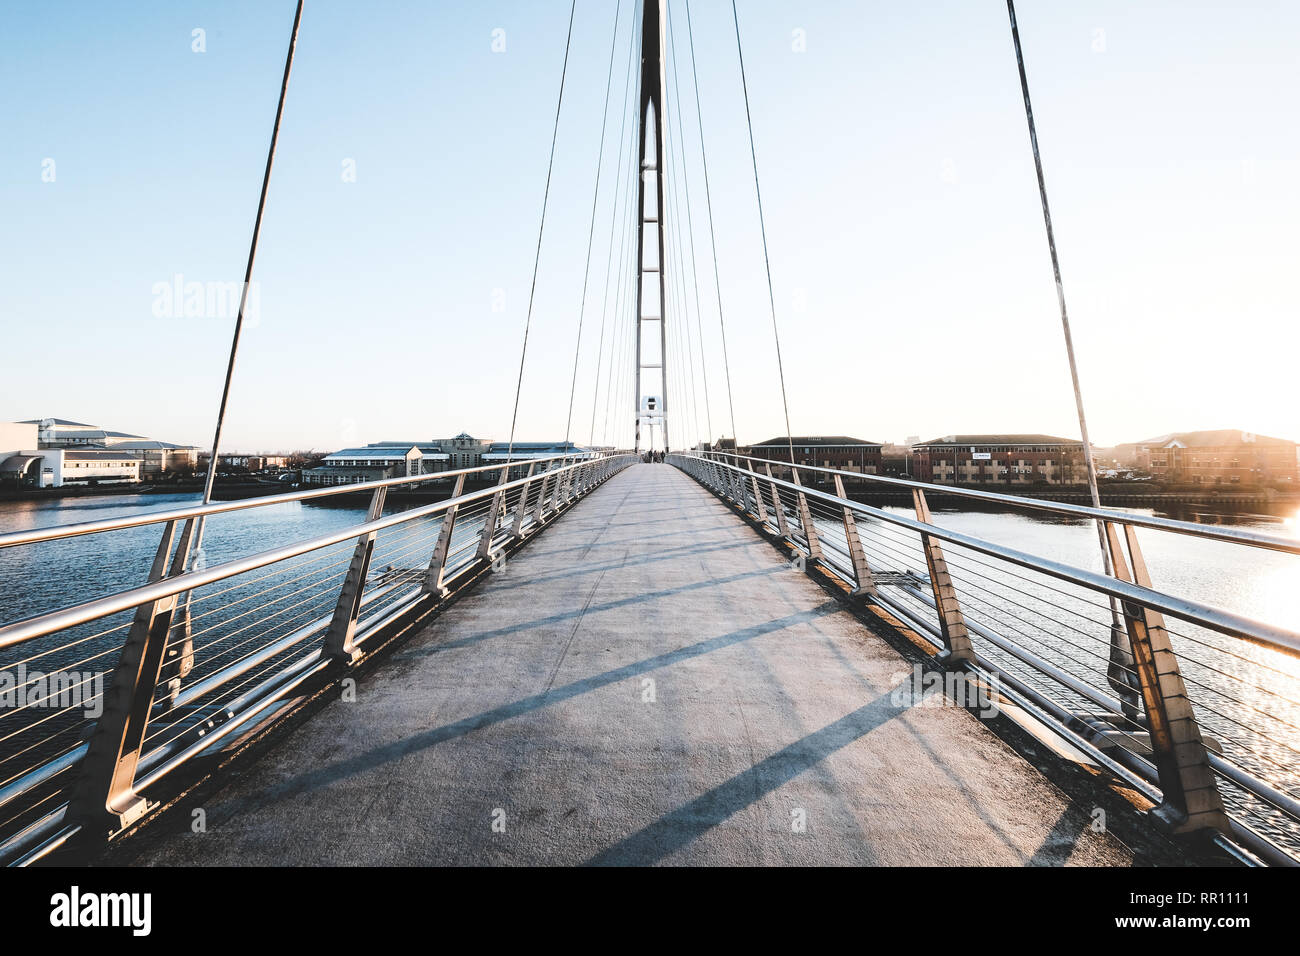 Infinity Brücke in Stockton-on-Tees, England Stockfoto